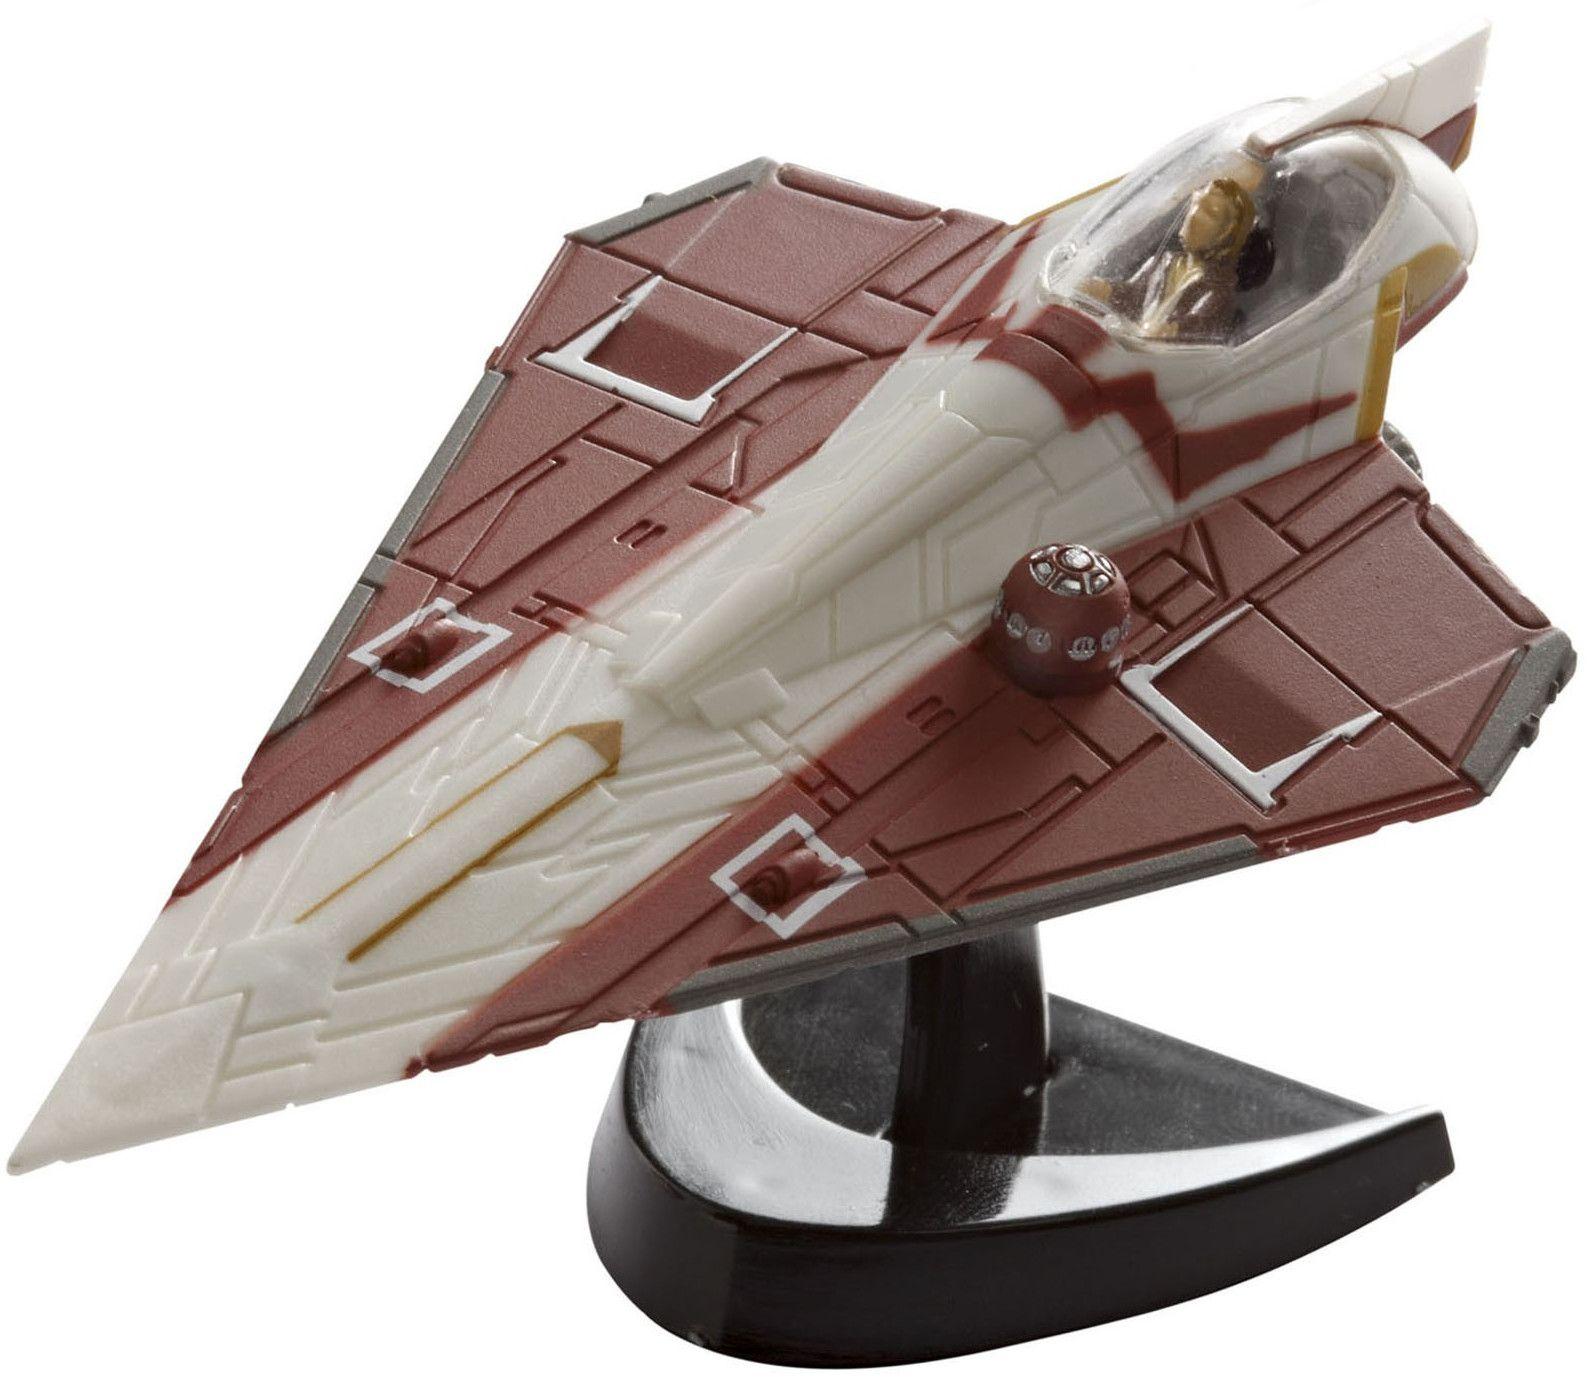 Сглобяем модел на космически кораб Revell Easykit Pocket STAR WARS - Jedi Starfighter (06731) - 1